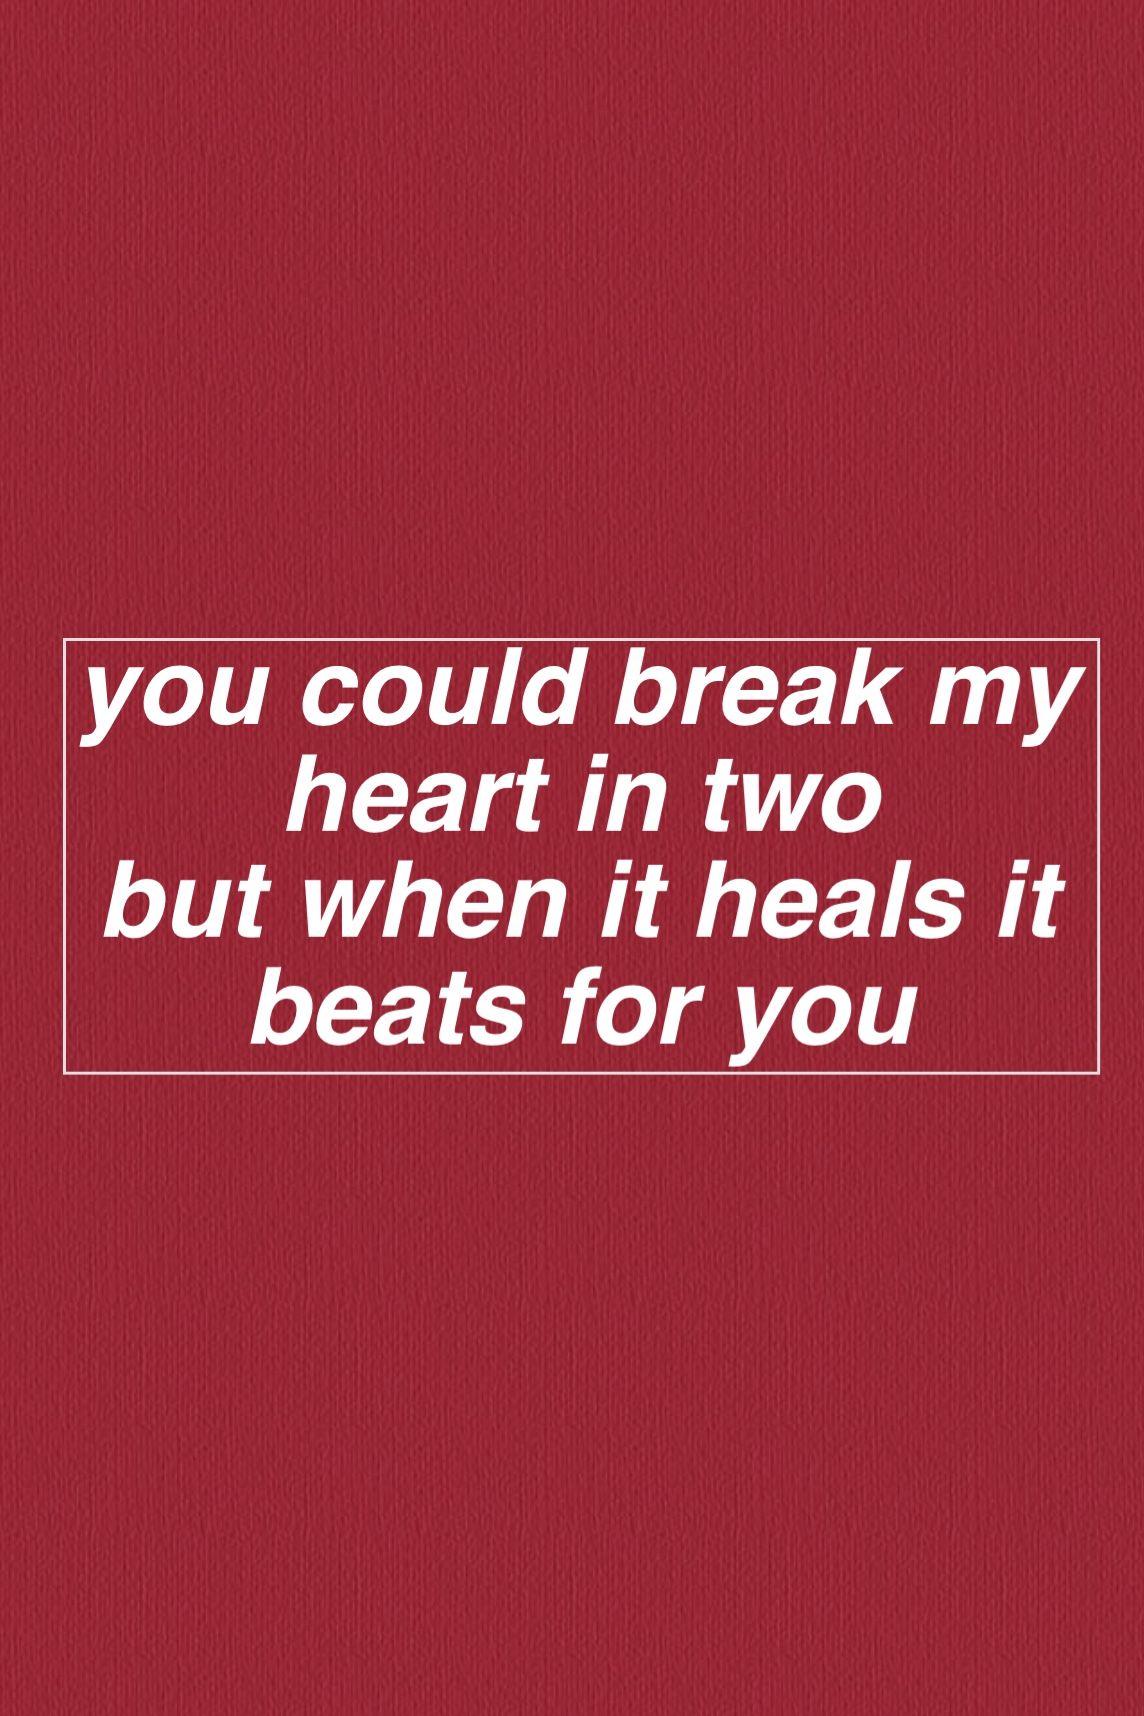 break my heart song lyrics